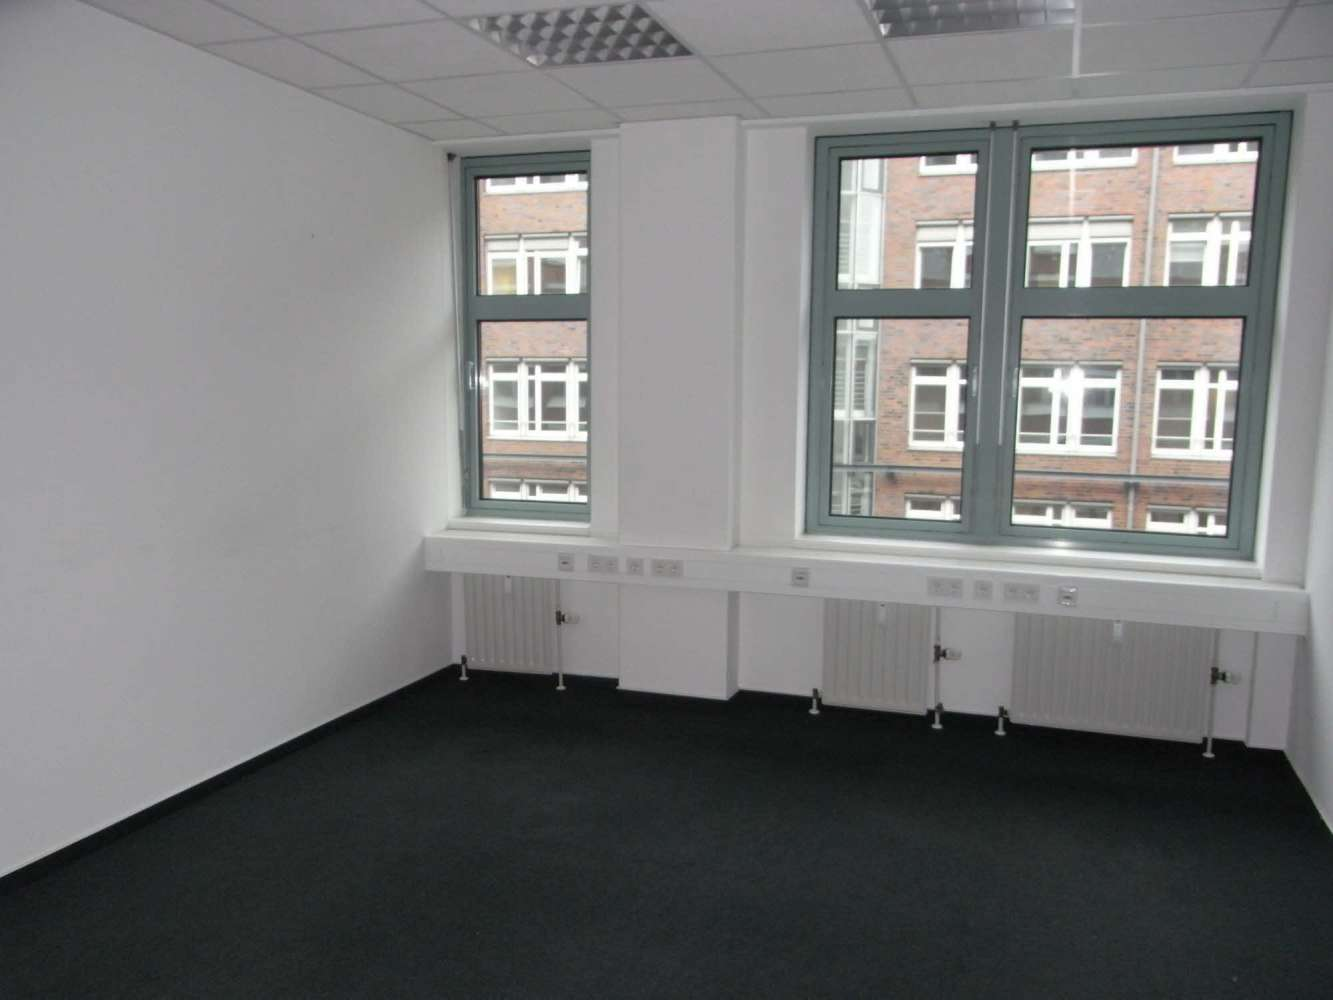 Büros Hamburg, 20459 - Büro - Hamburg, Neustadt - H0002 - 9397007